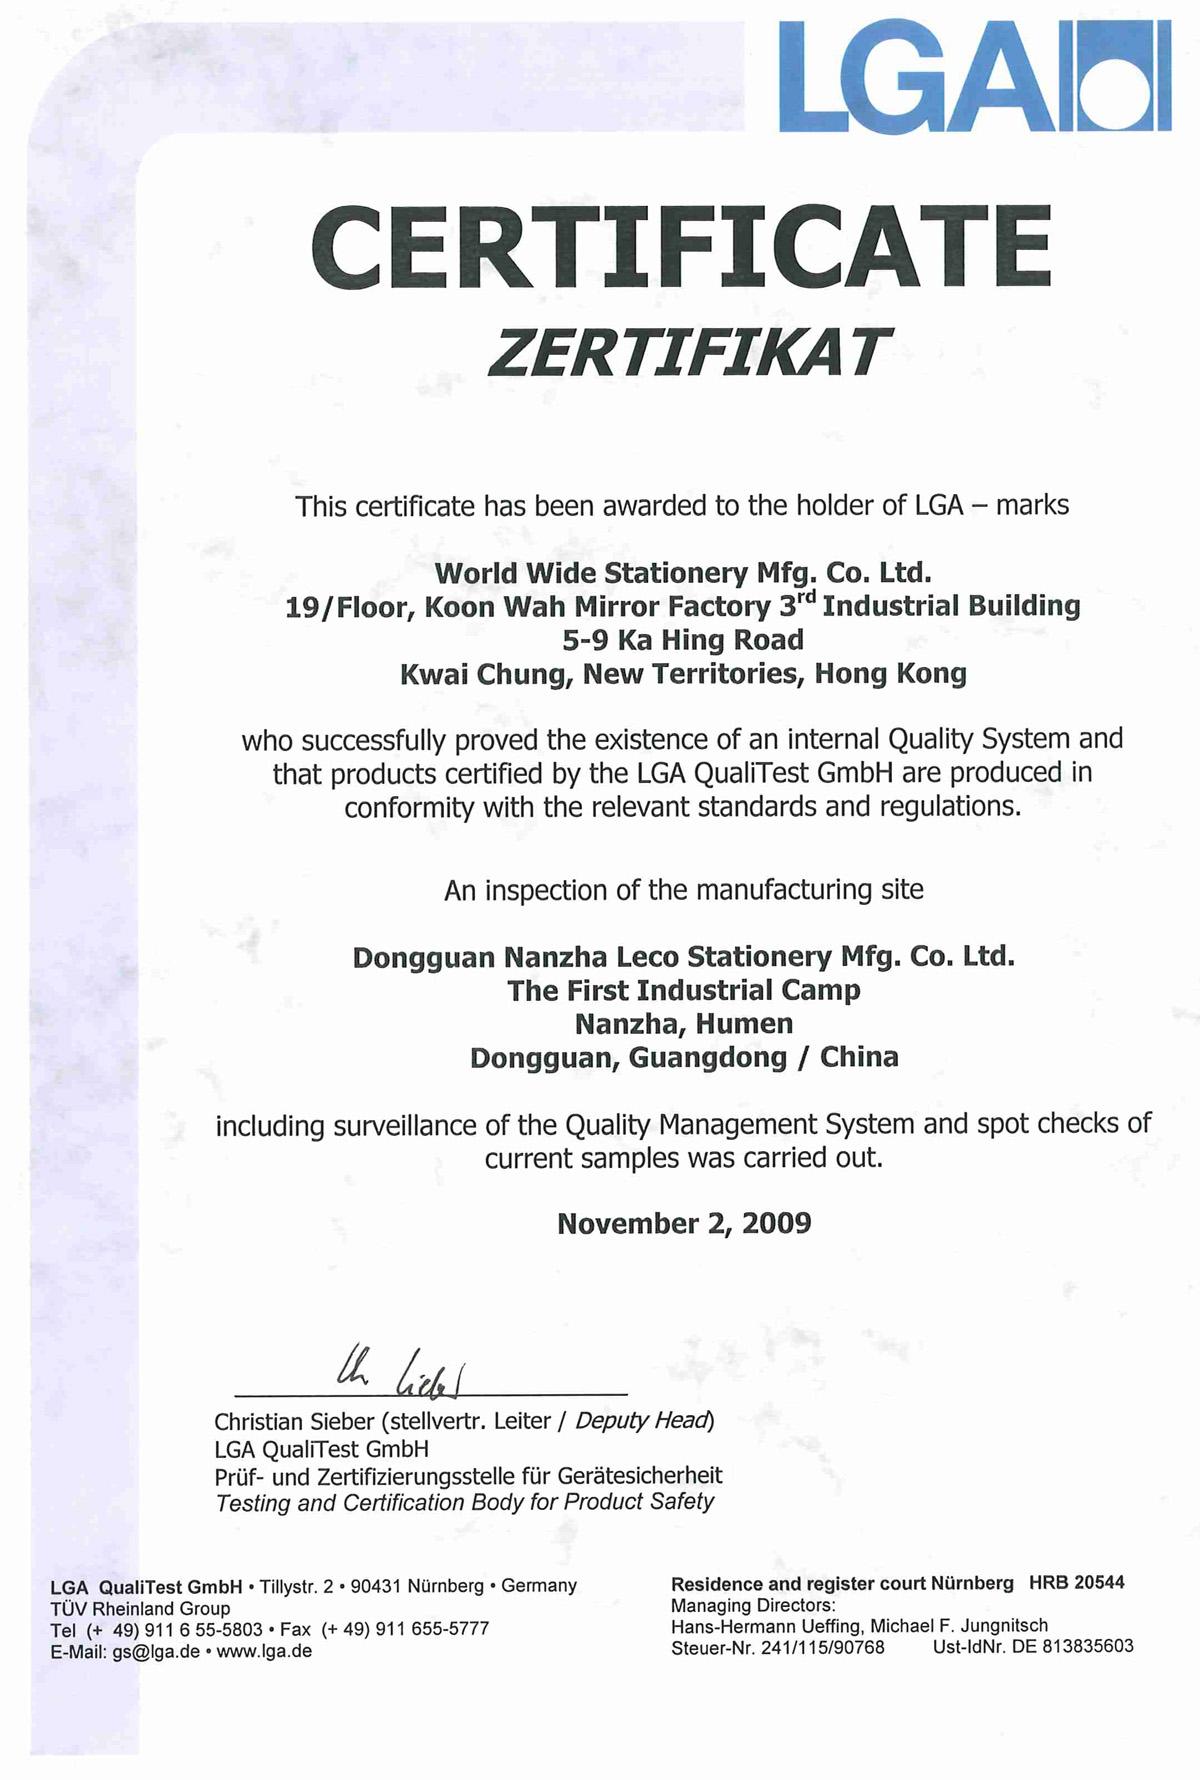 World Wide Stationery Award